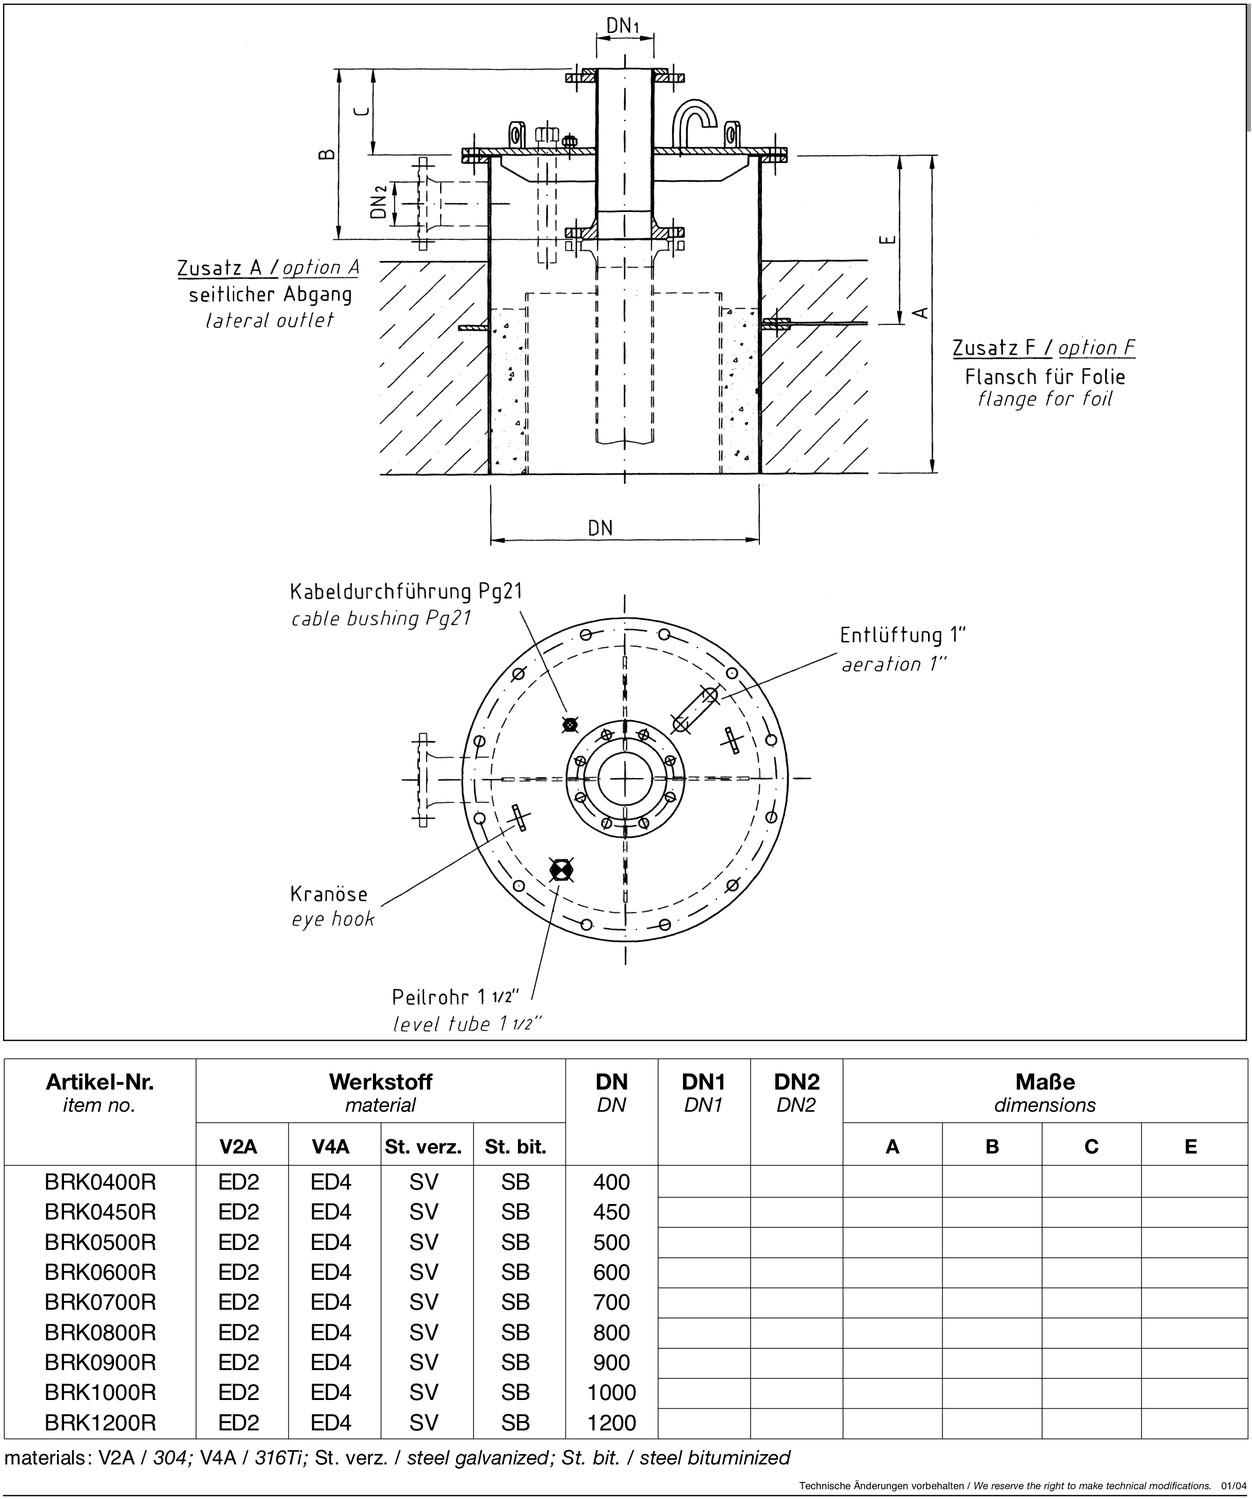 e30 brunnenkopf nach din 4926 vielberth fritz gmbh co kg. Black Bedroom Furniture Sets. Home Design Ideas